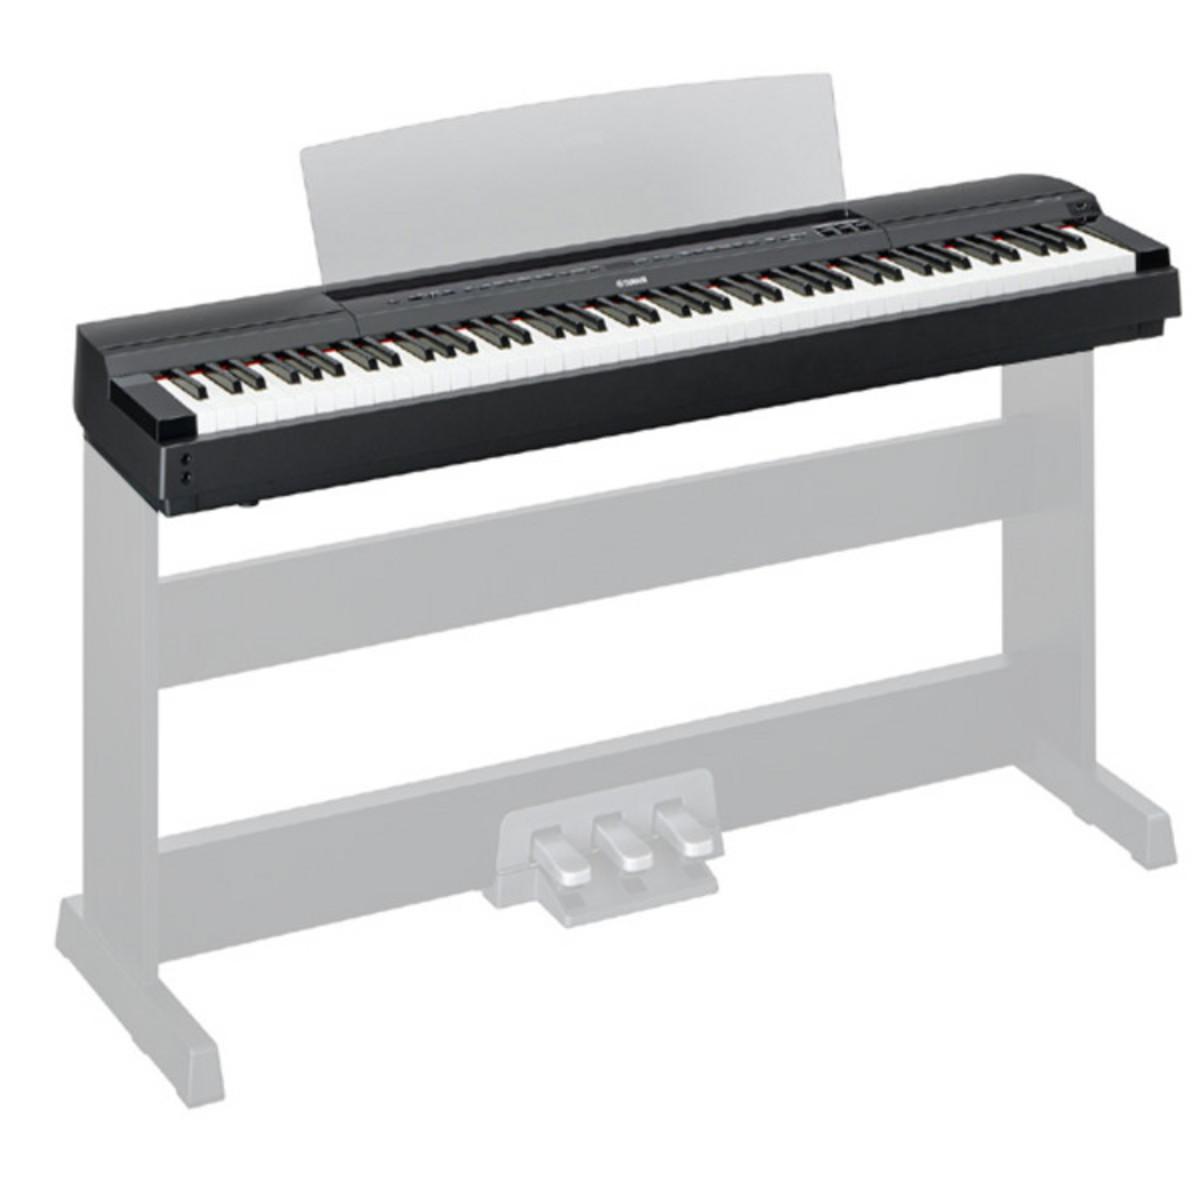 yamaha p255 lightweight digital piano black at. Black Bedroom Furniture Sets. Home Design Ideas